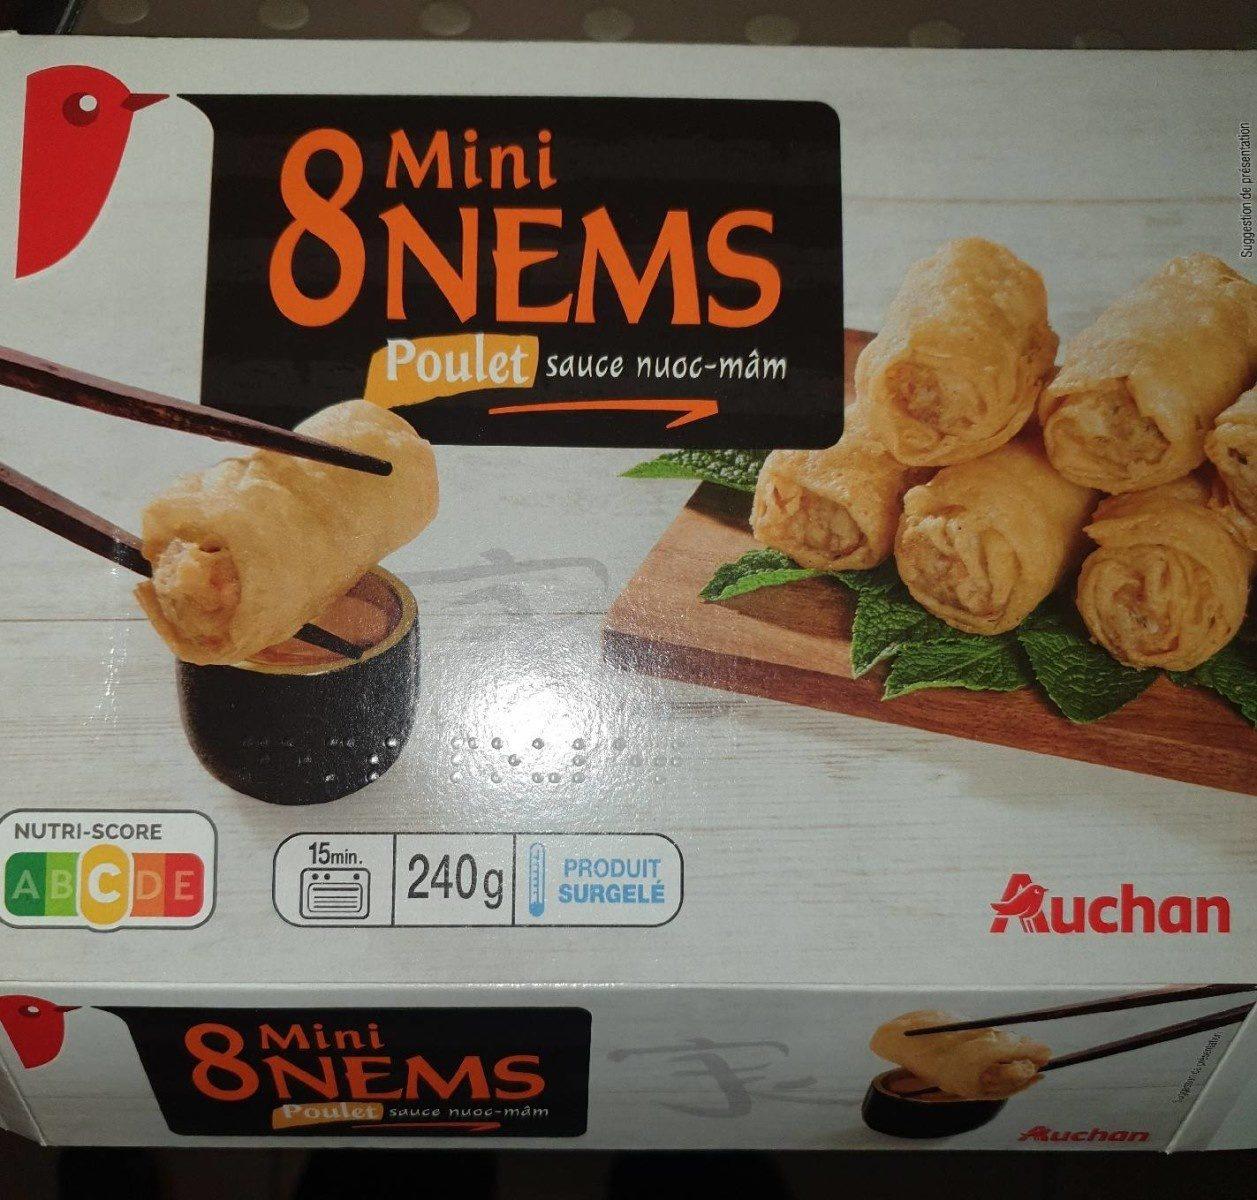 8 mini nems - Product - fr